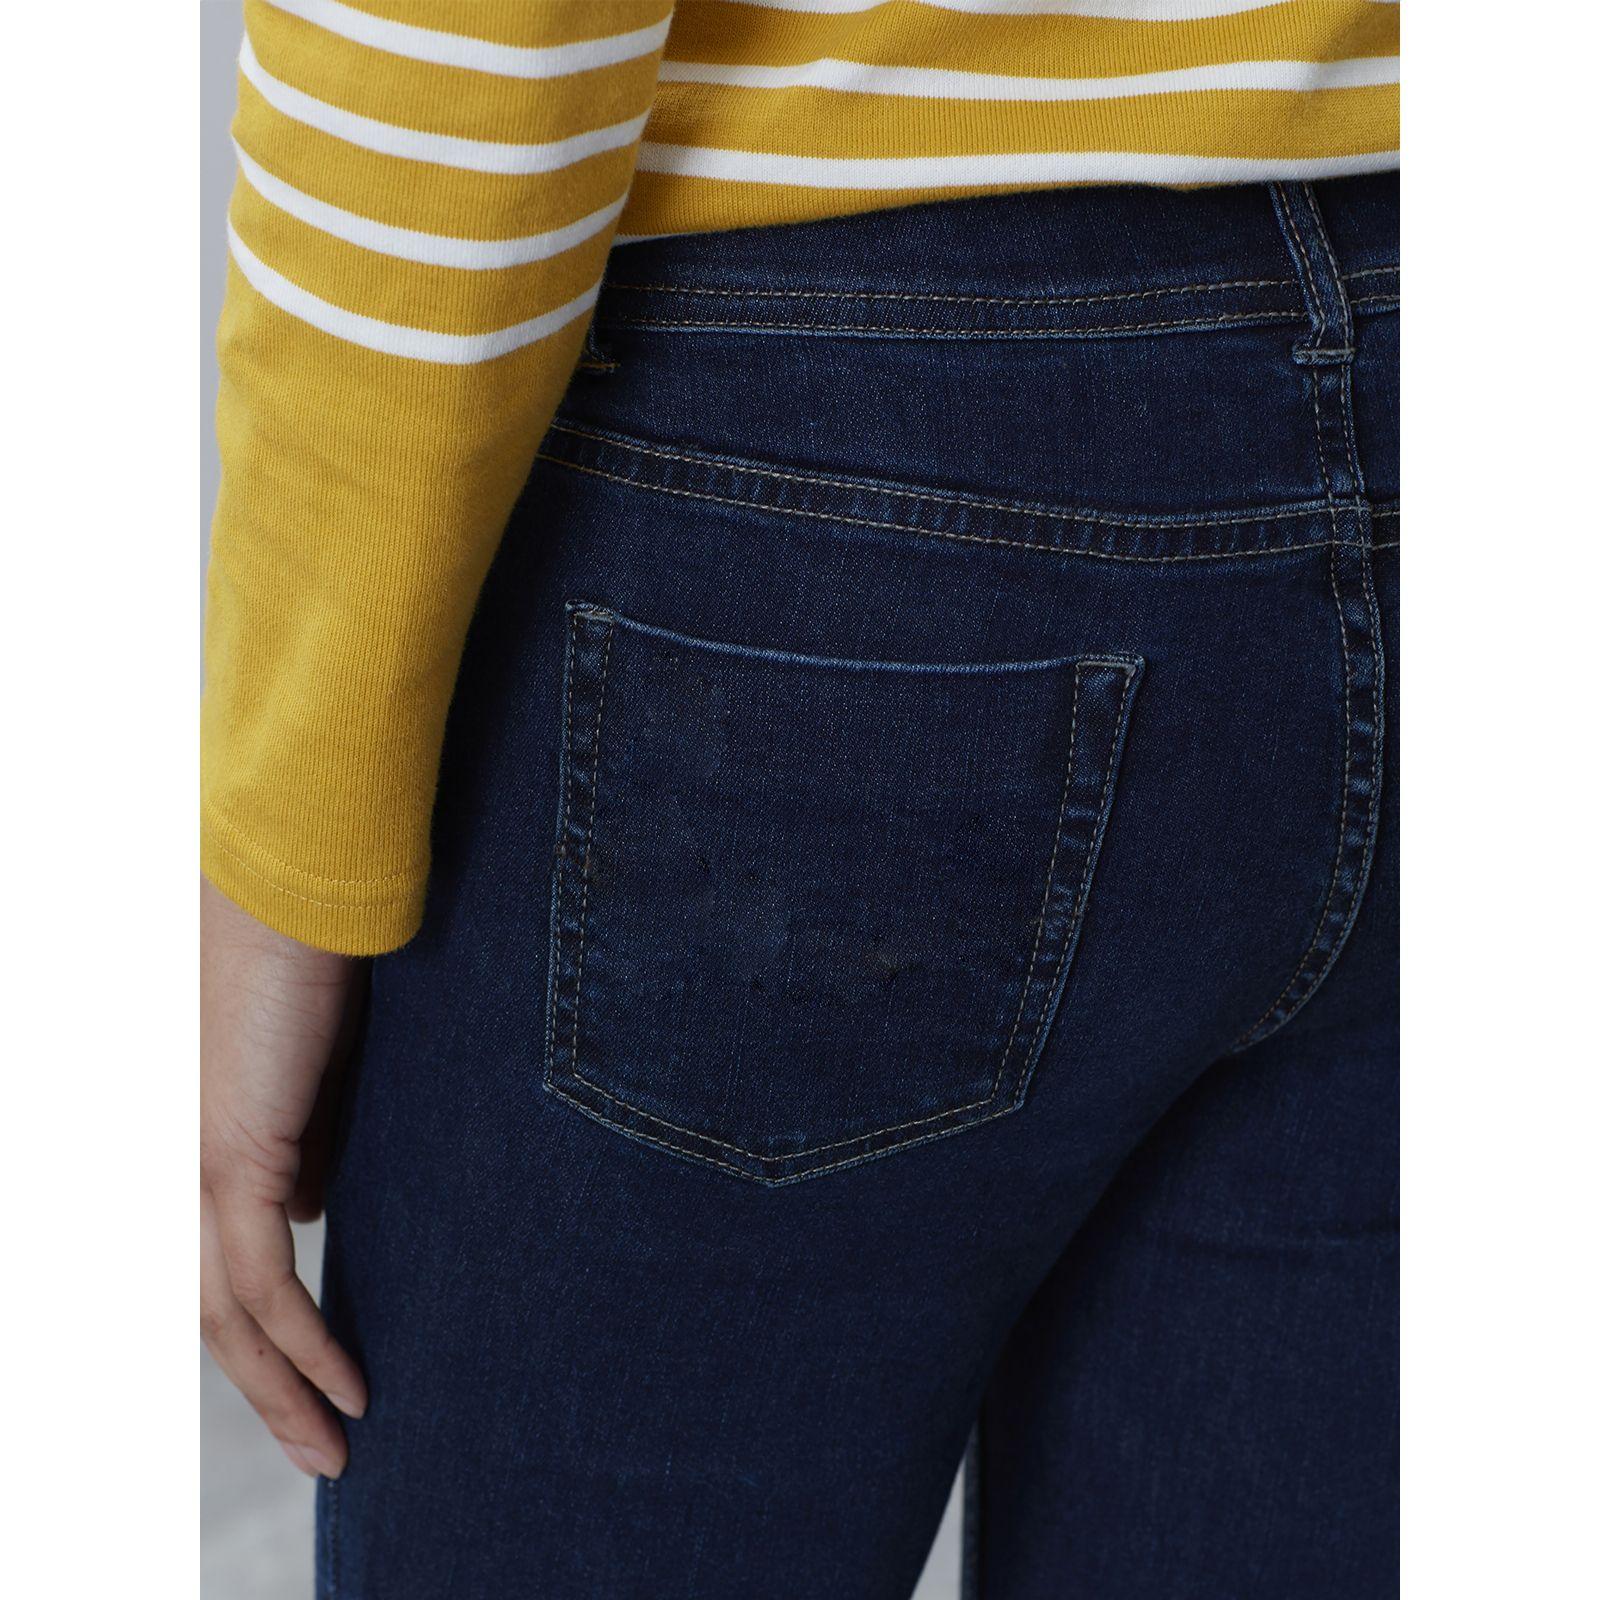 1a1a20e8f4068f Joules Monroe Skinny Stretch Jeans - QVC UK